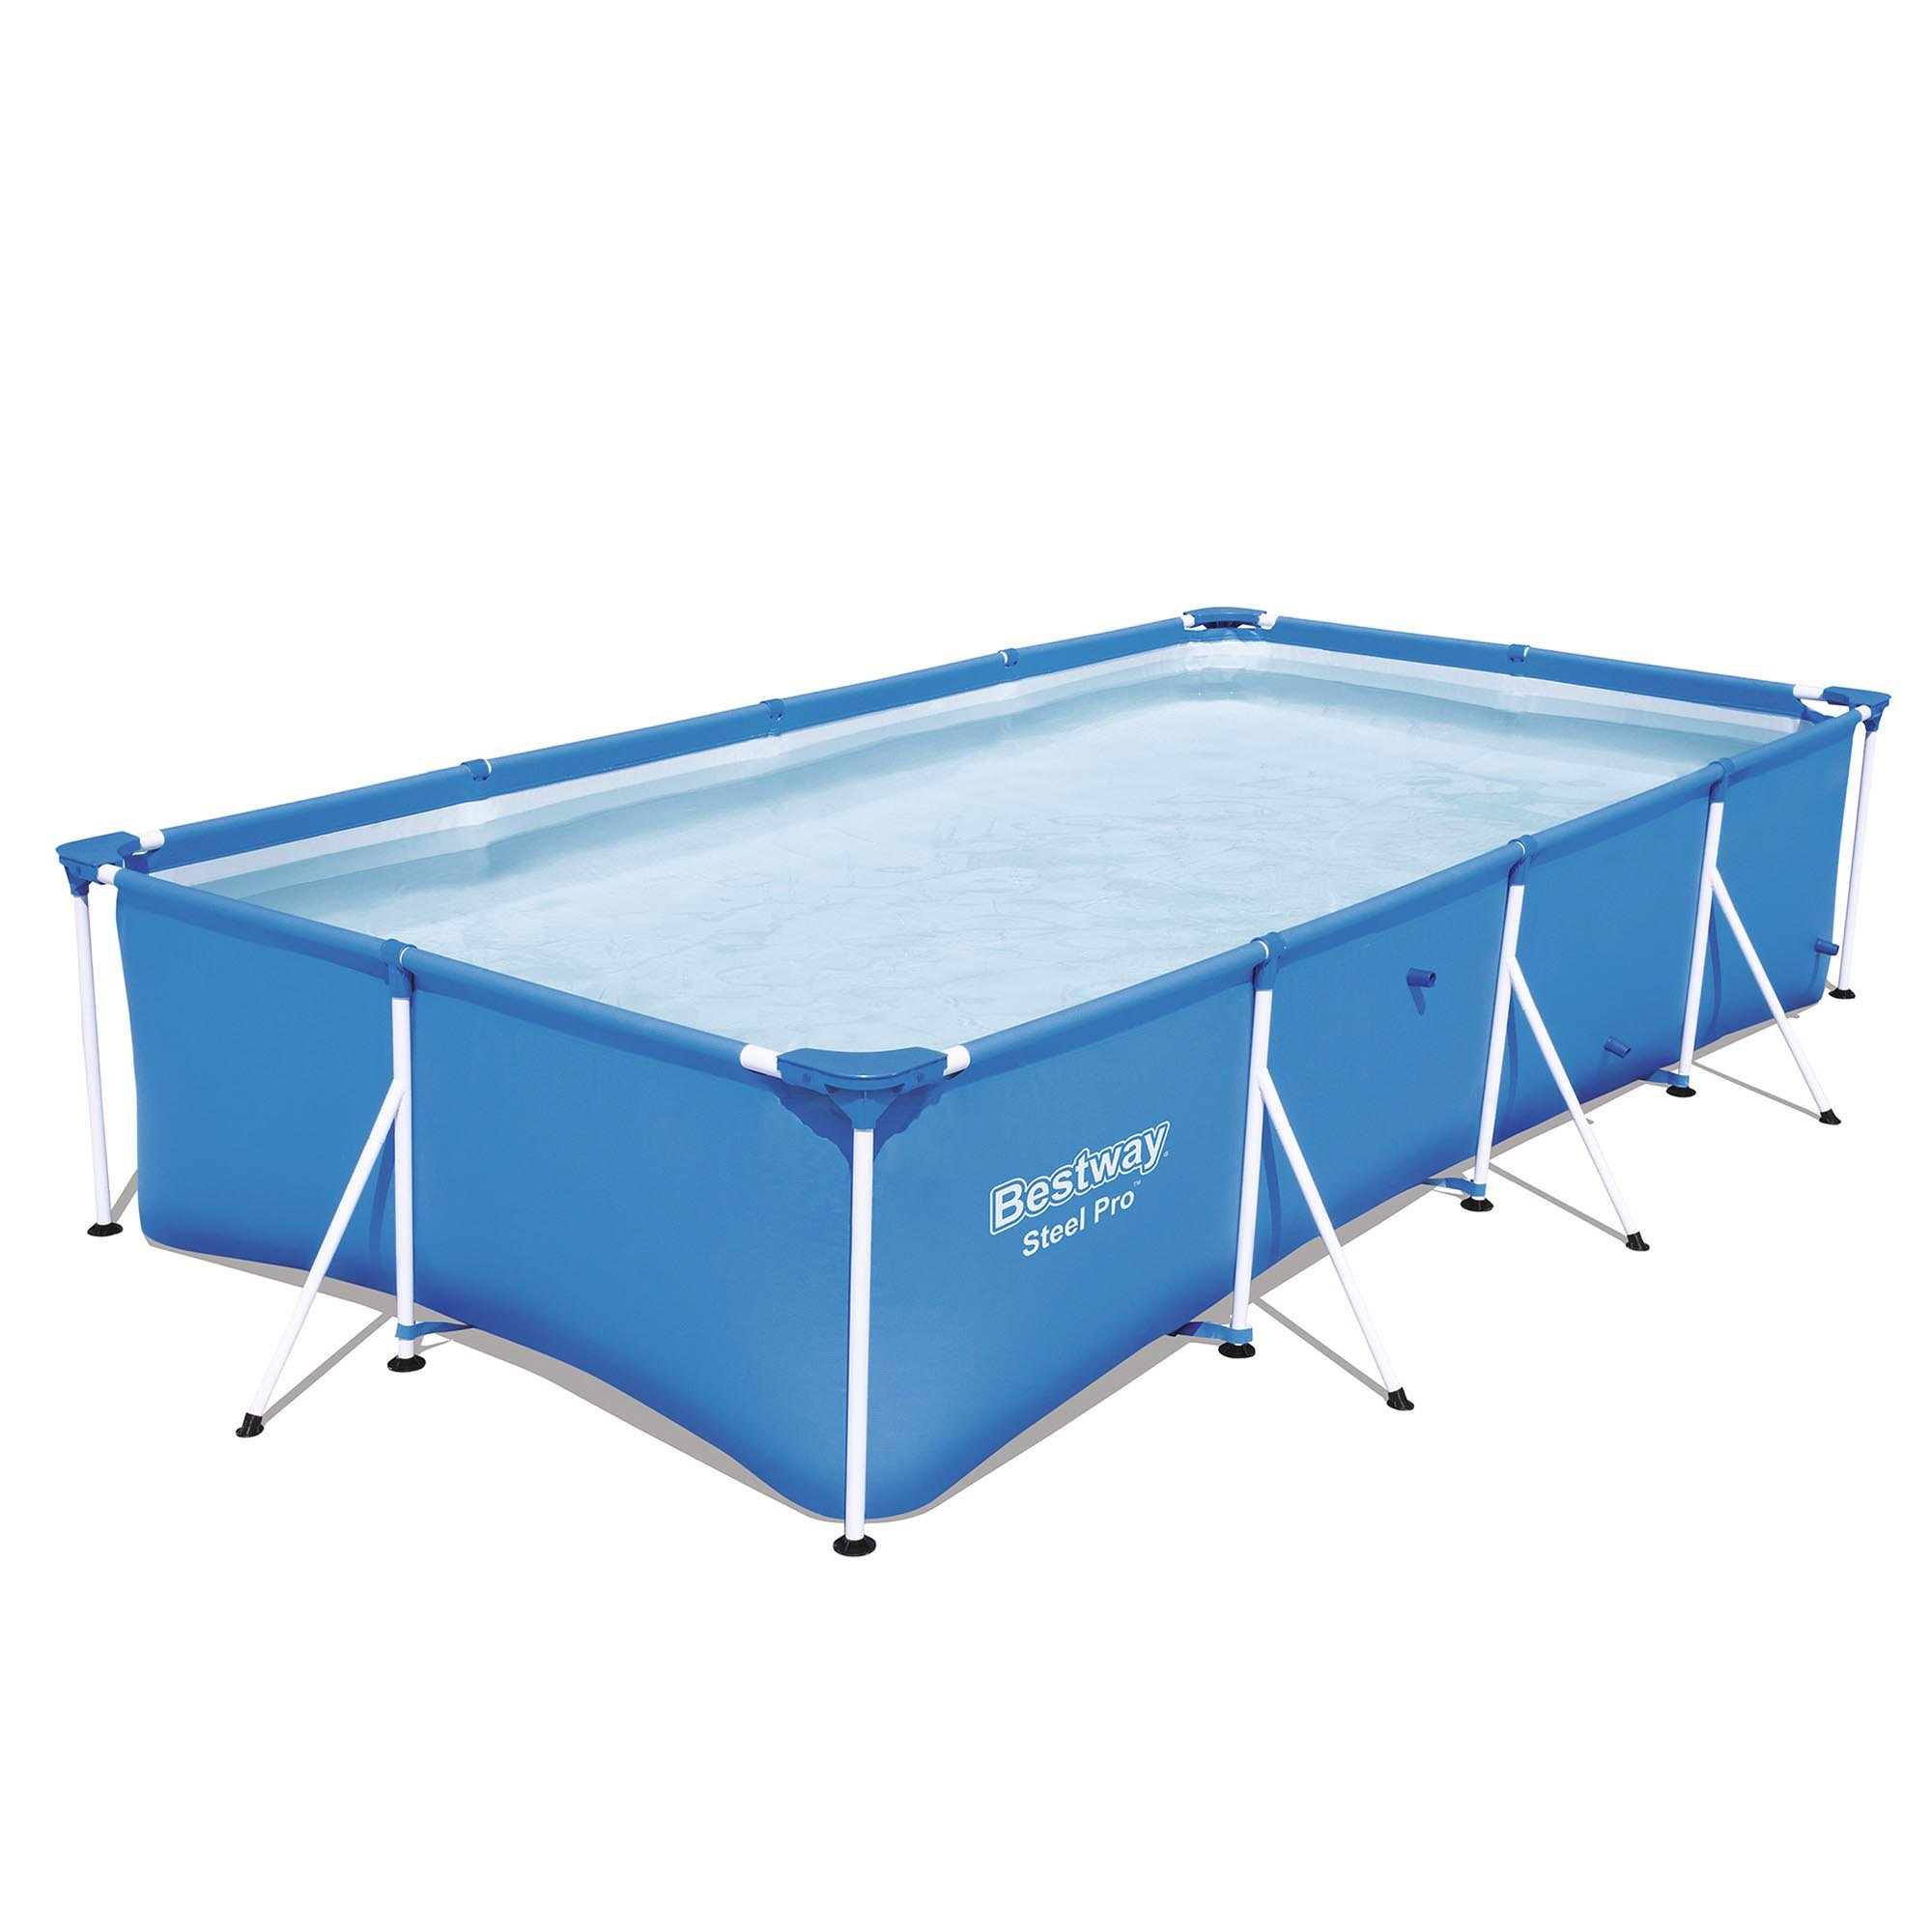 Bestway Steel Pro 157 x 83 x 32'' Rectangular Frame Above Ground Swimming Pool